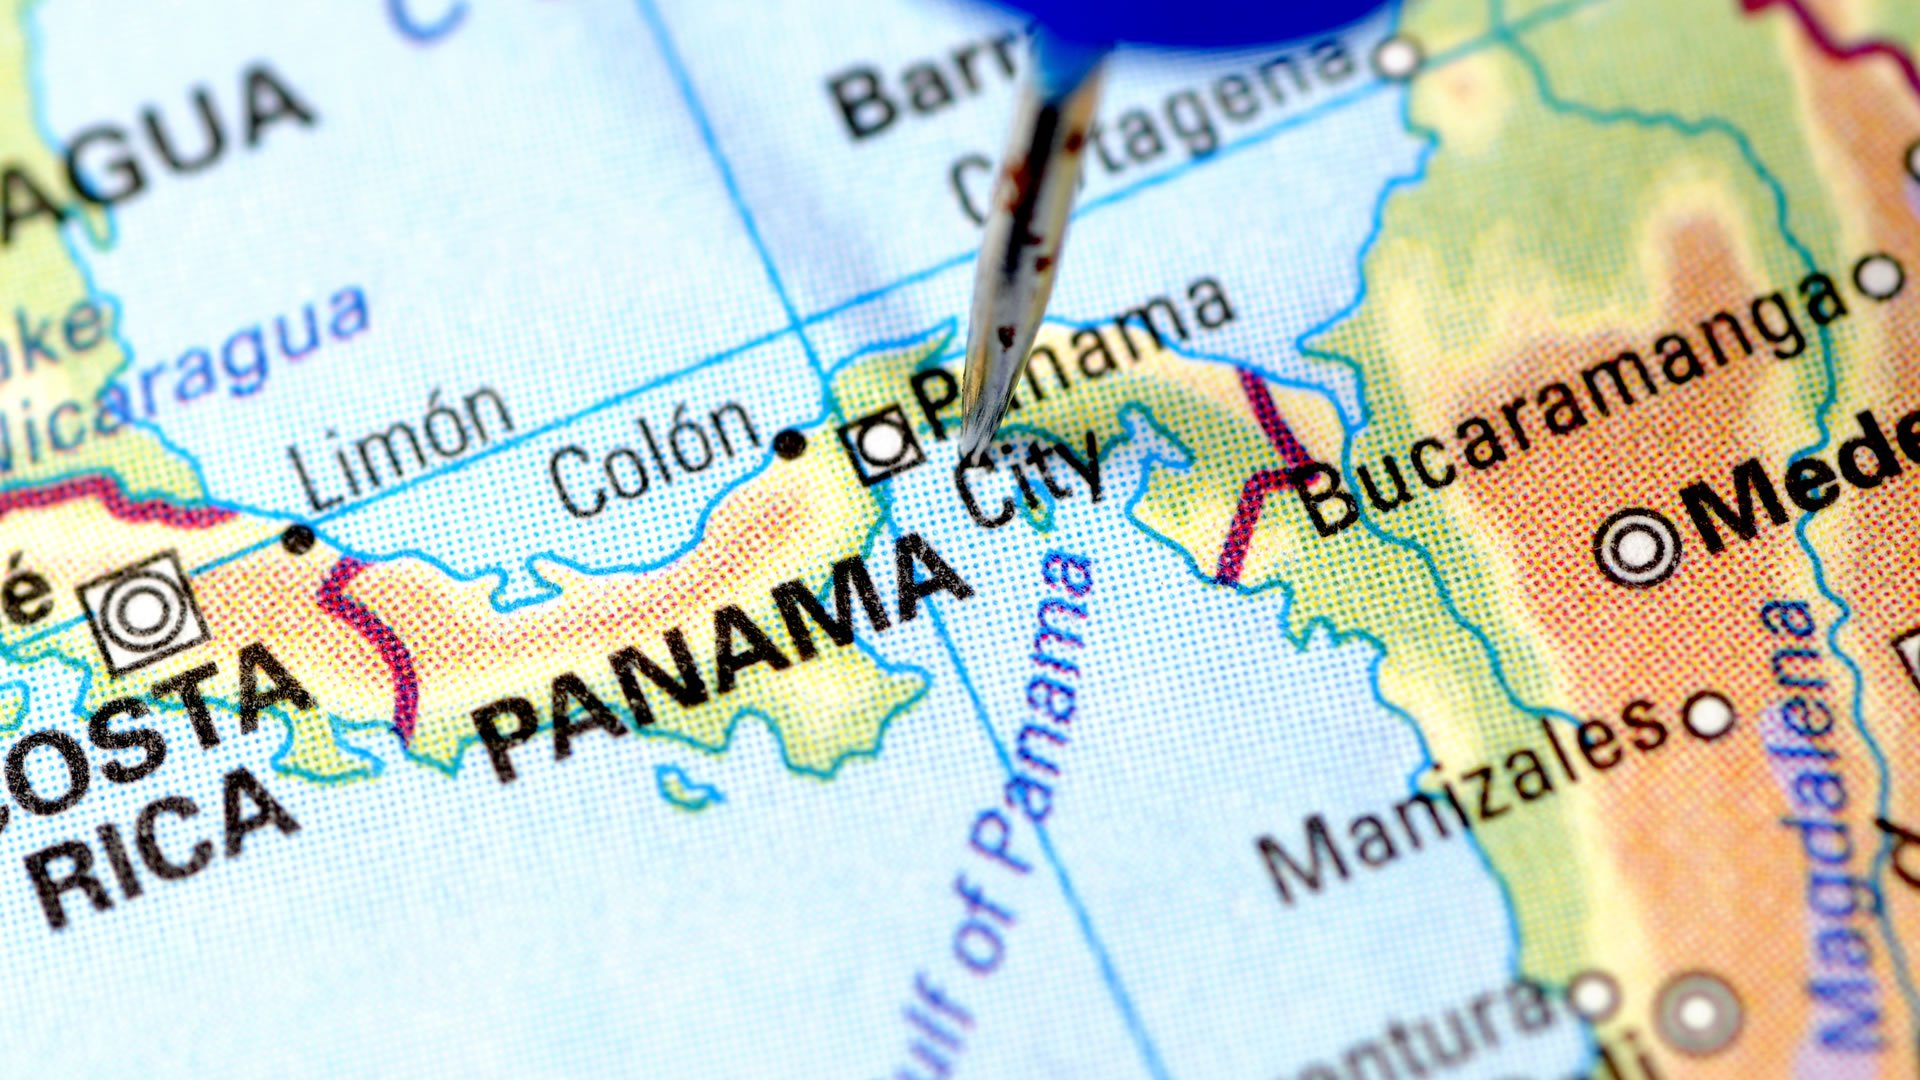 REQUISITOS PARA ENTRAR A PANAMÁ DESDE VENEZUELA